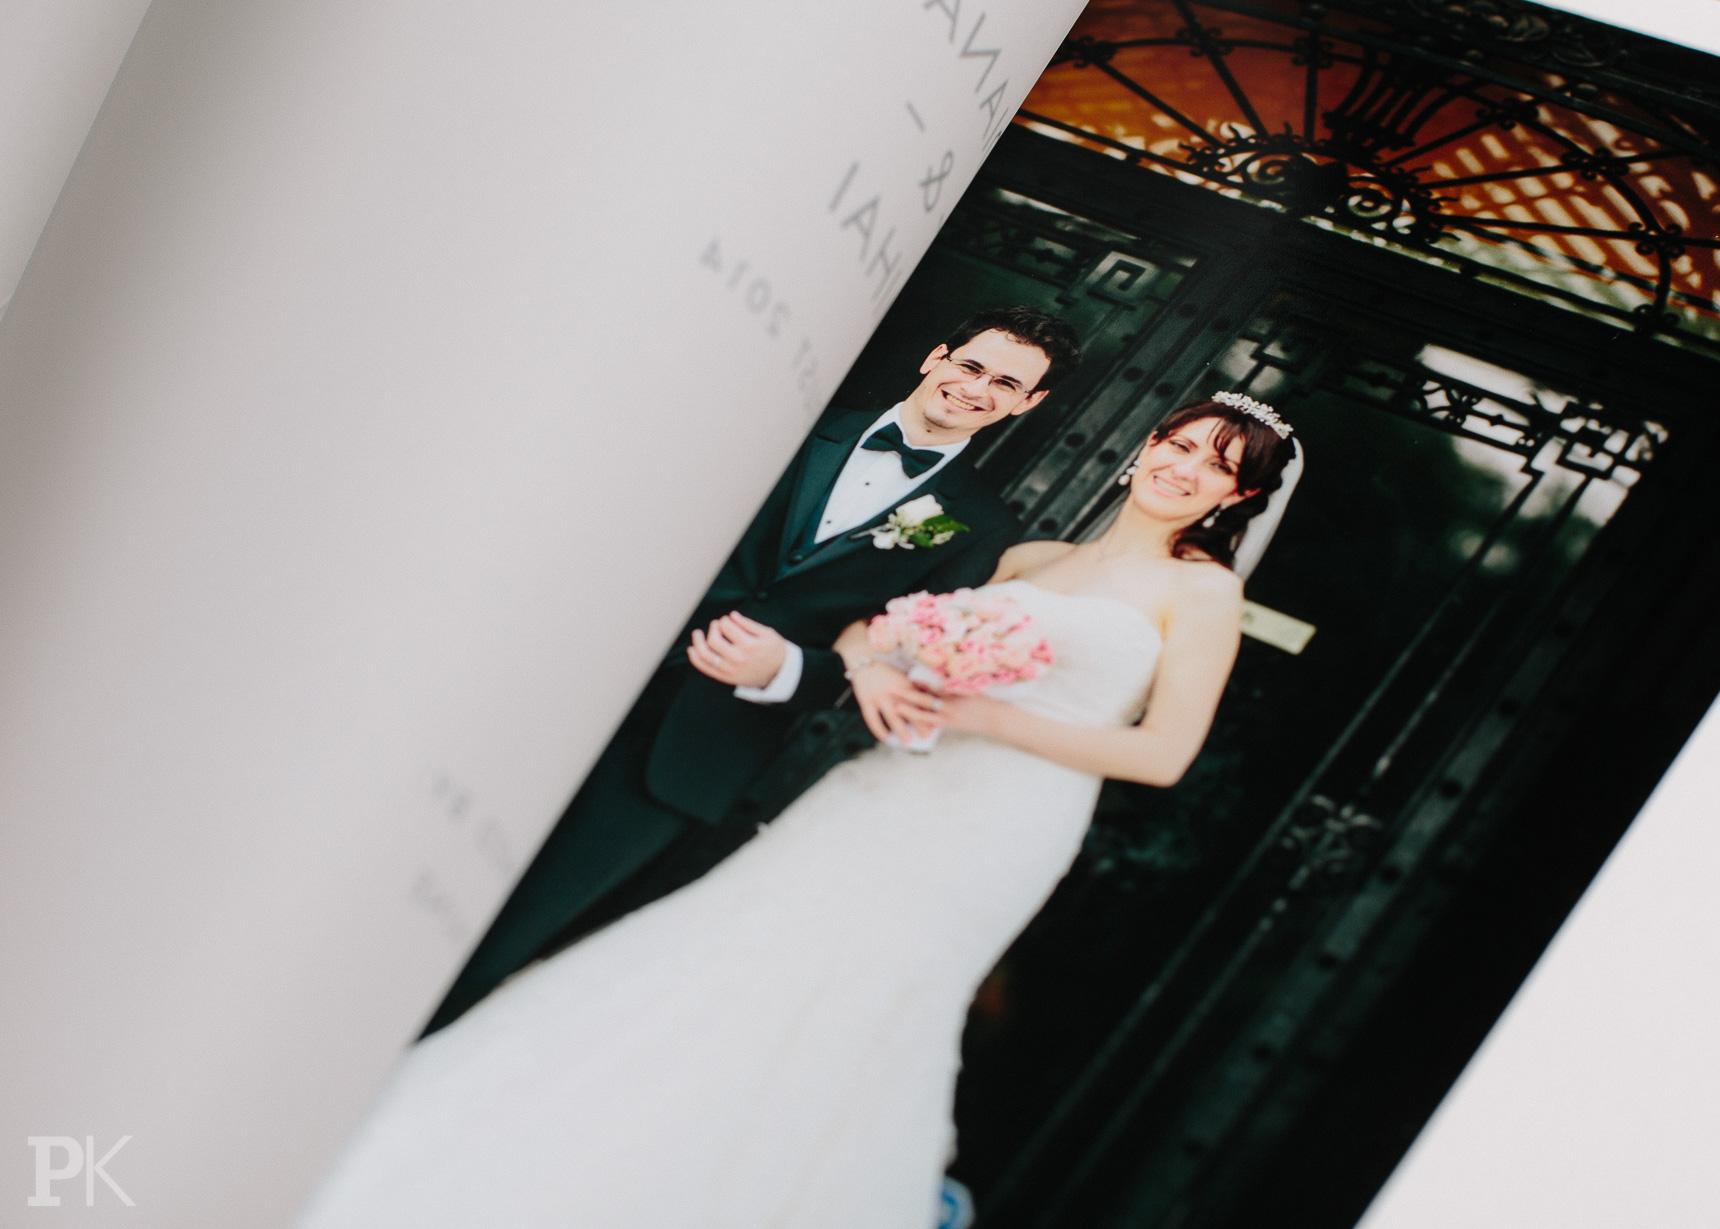 Toronto wedding photography albums queensberry